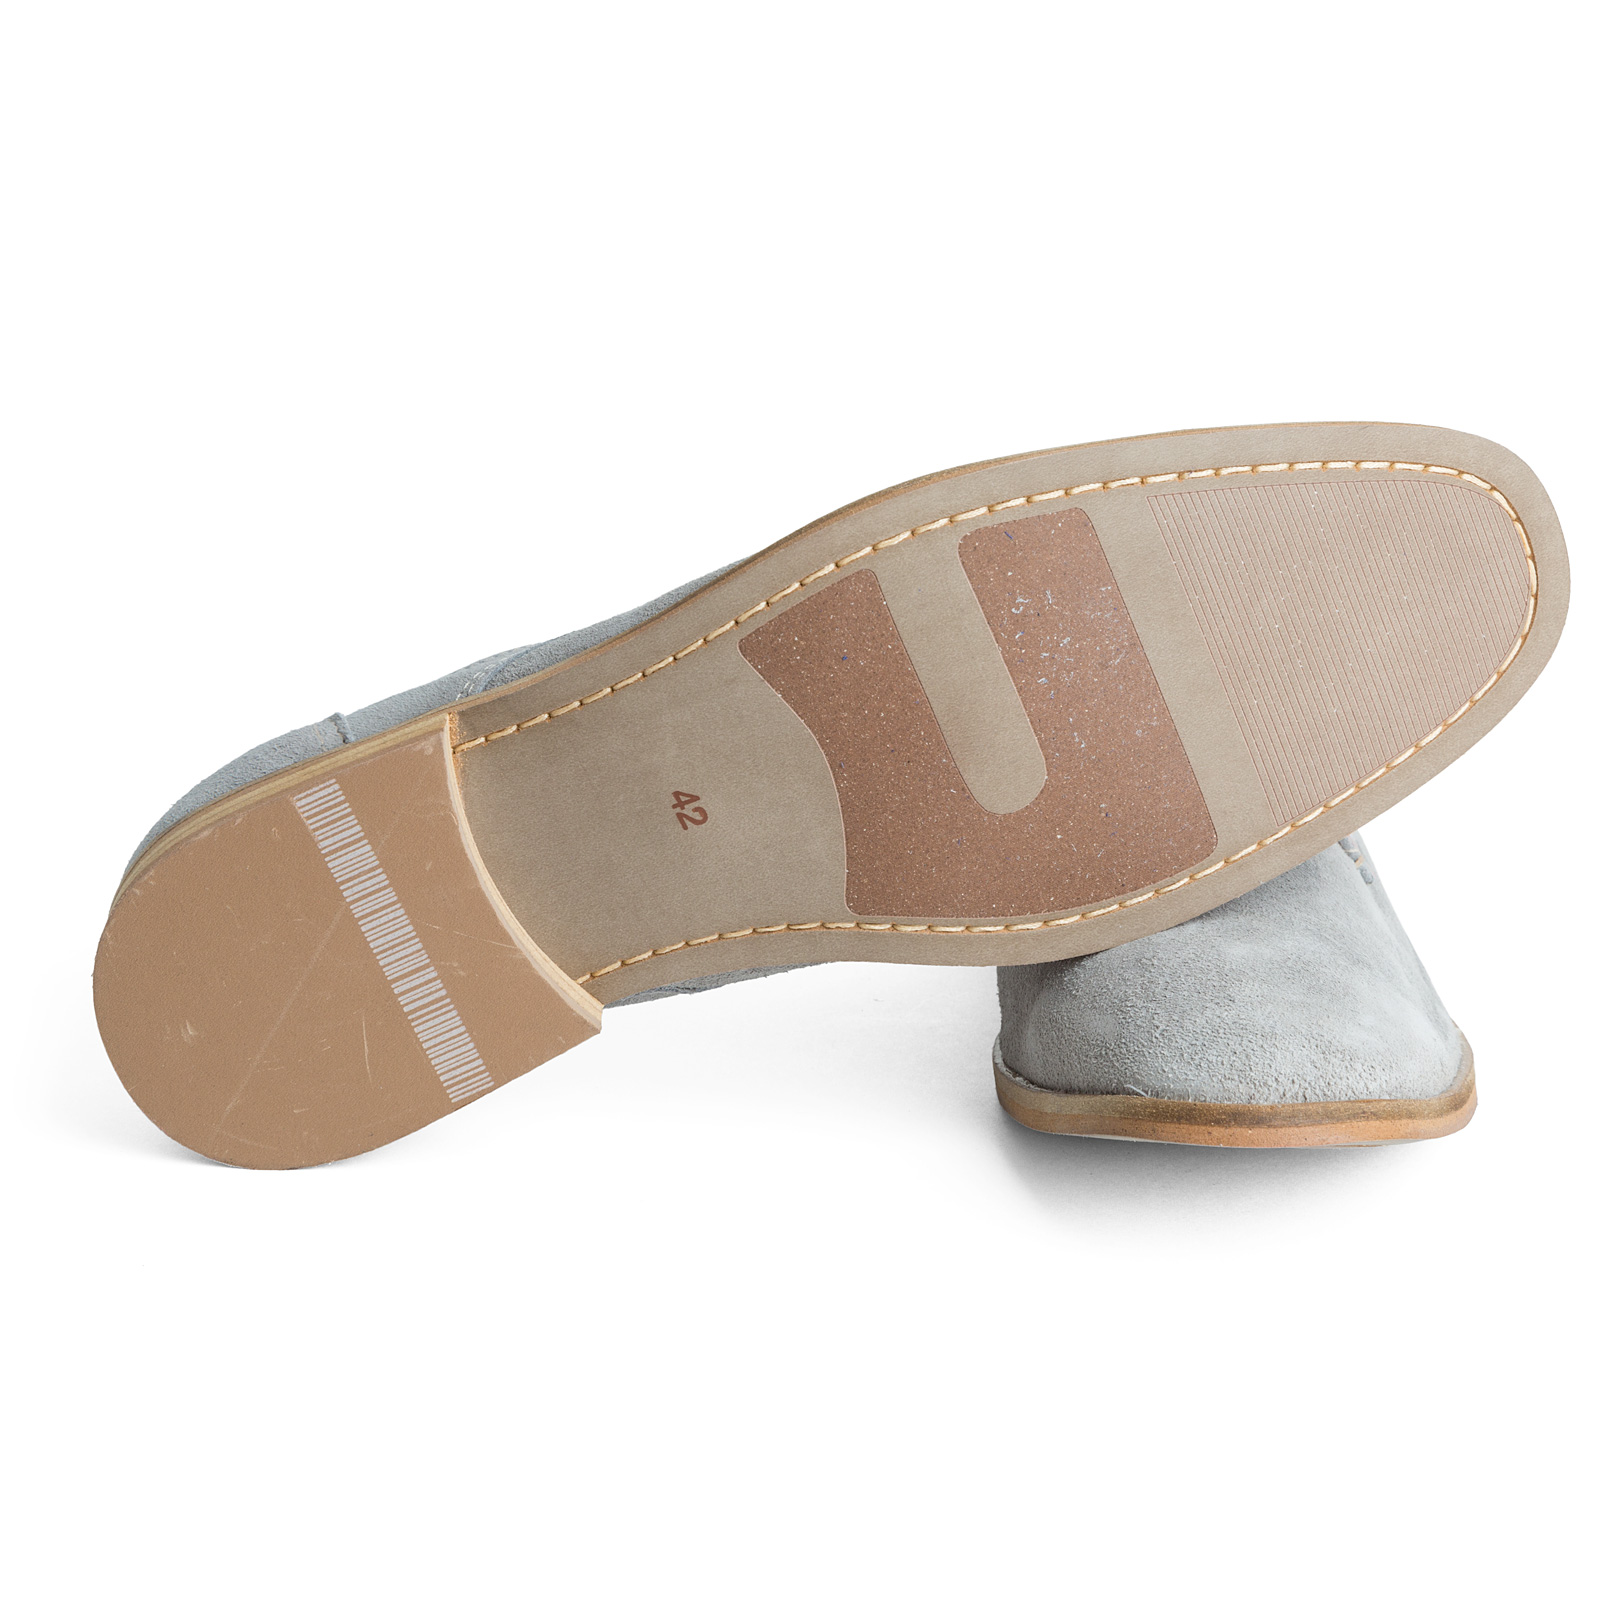 Pantane Suede Casual Shoe Coxx Borba 2014ss Shoes Boots